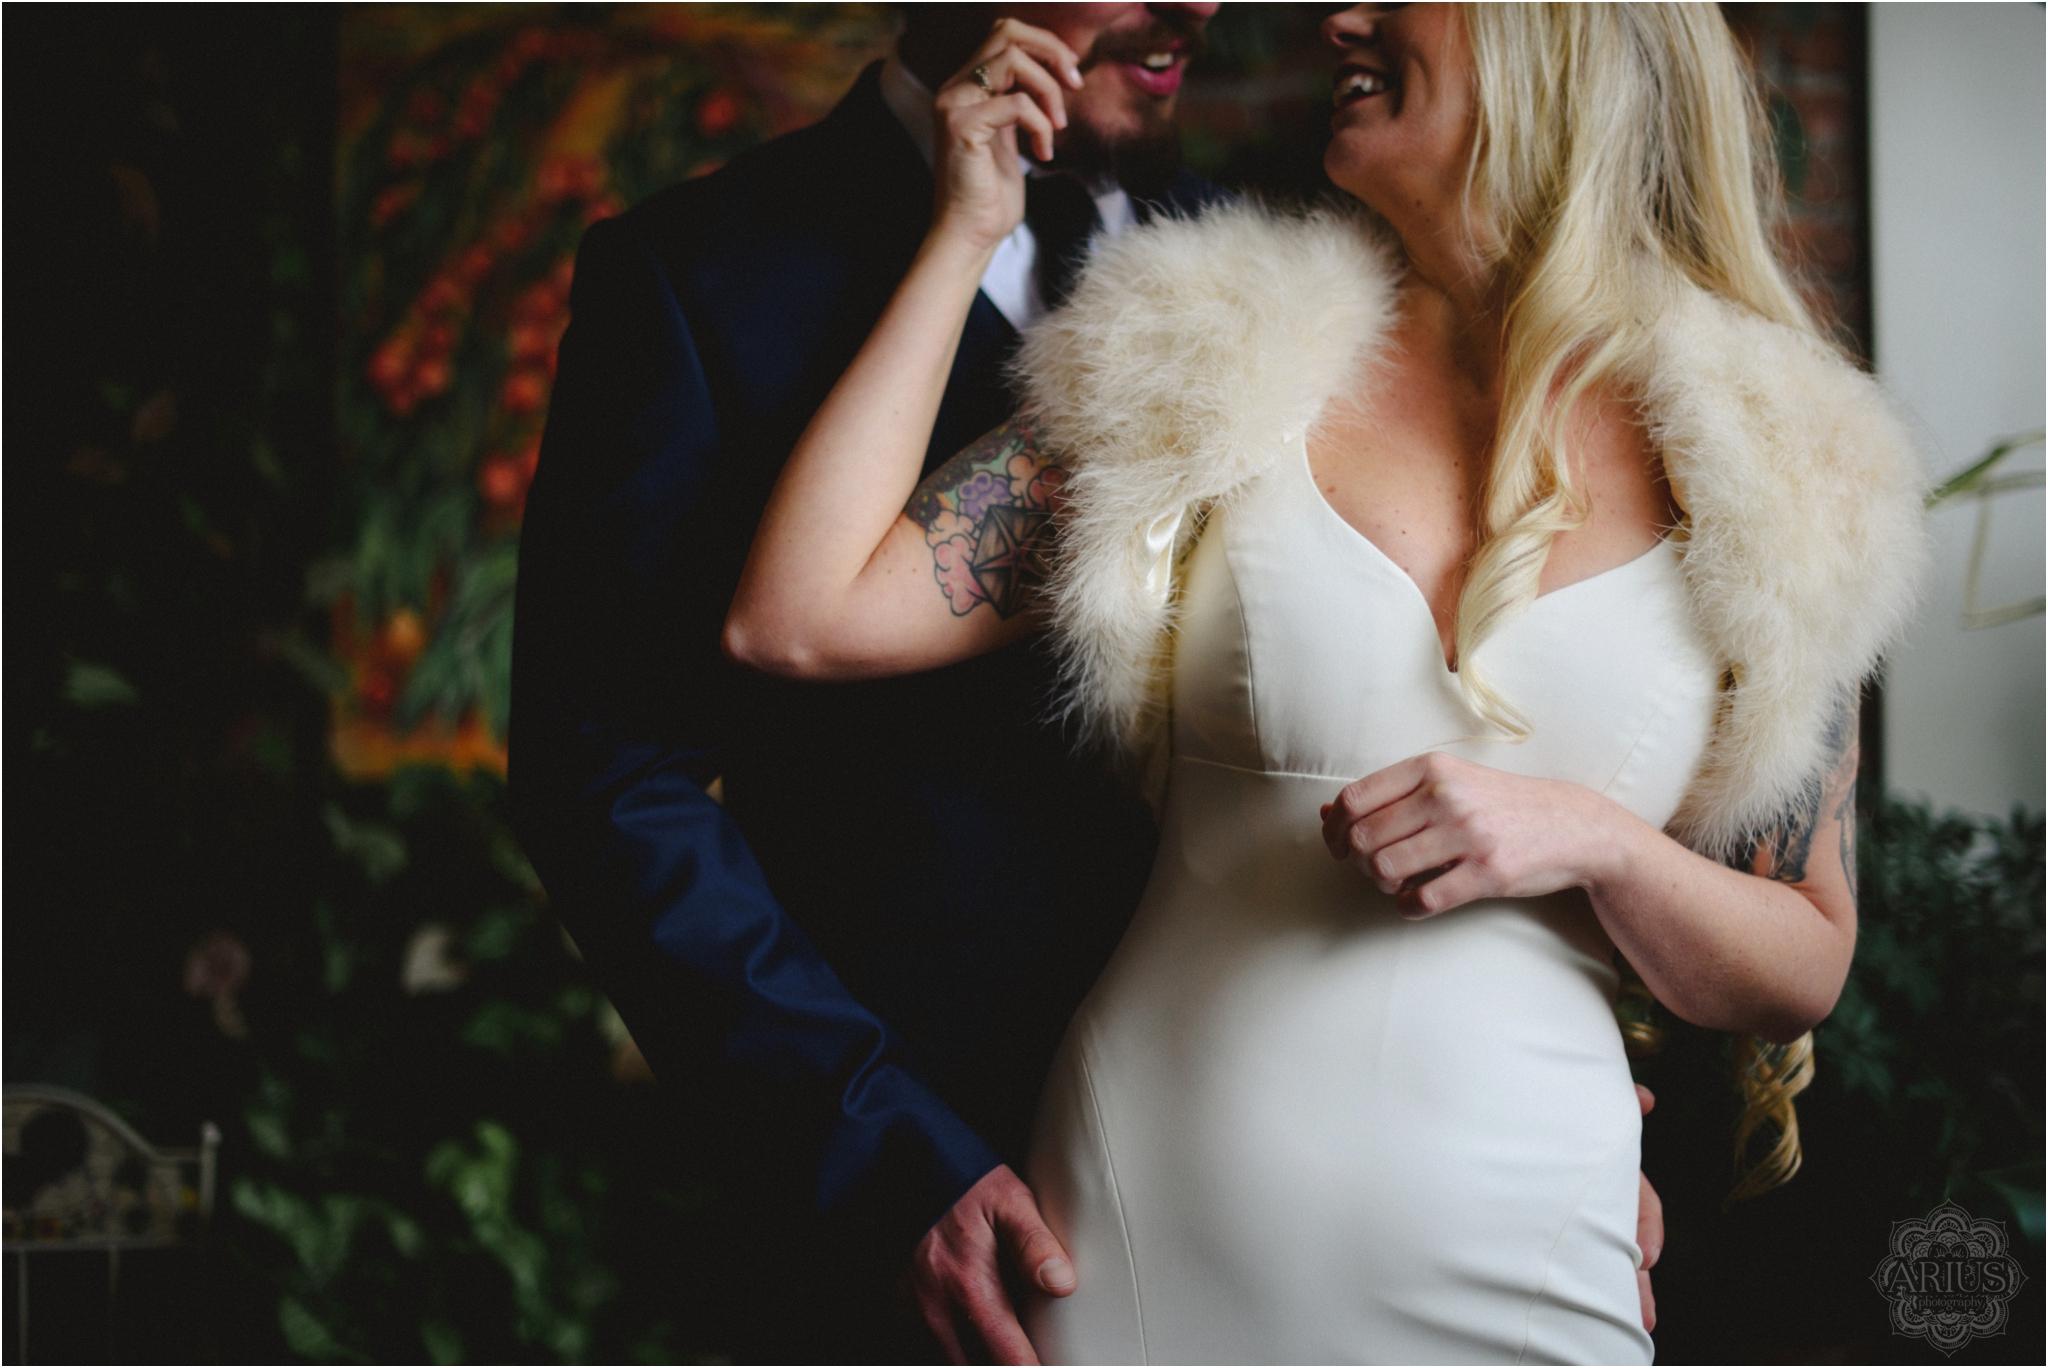 Best Hudson Valley Wedding Photographer - Arius Photo